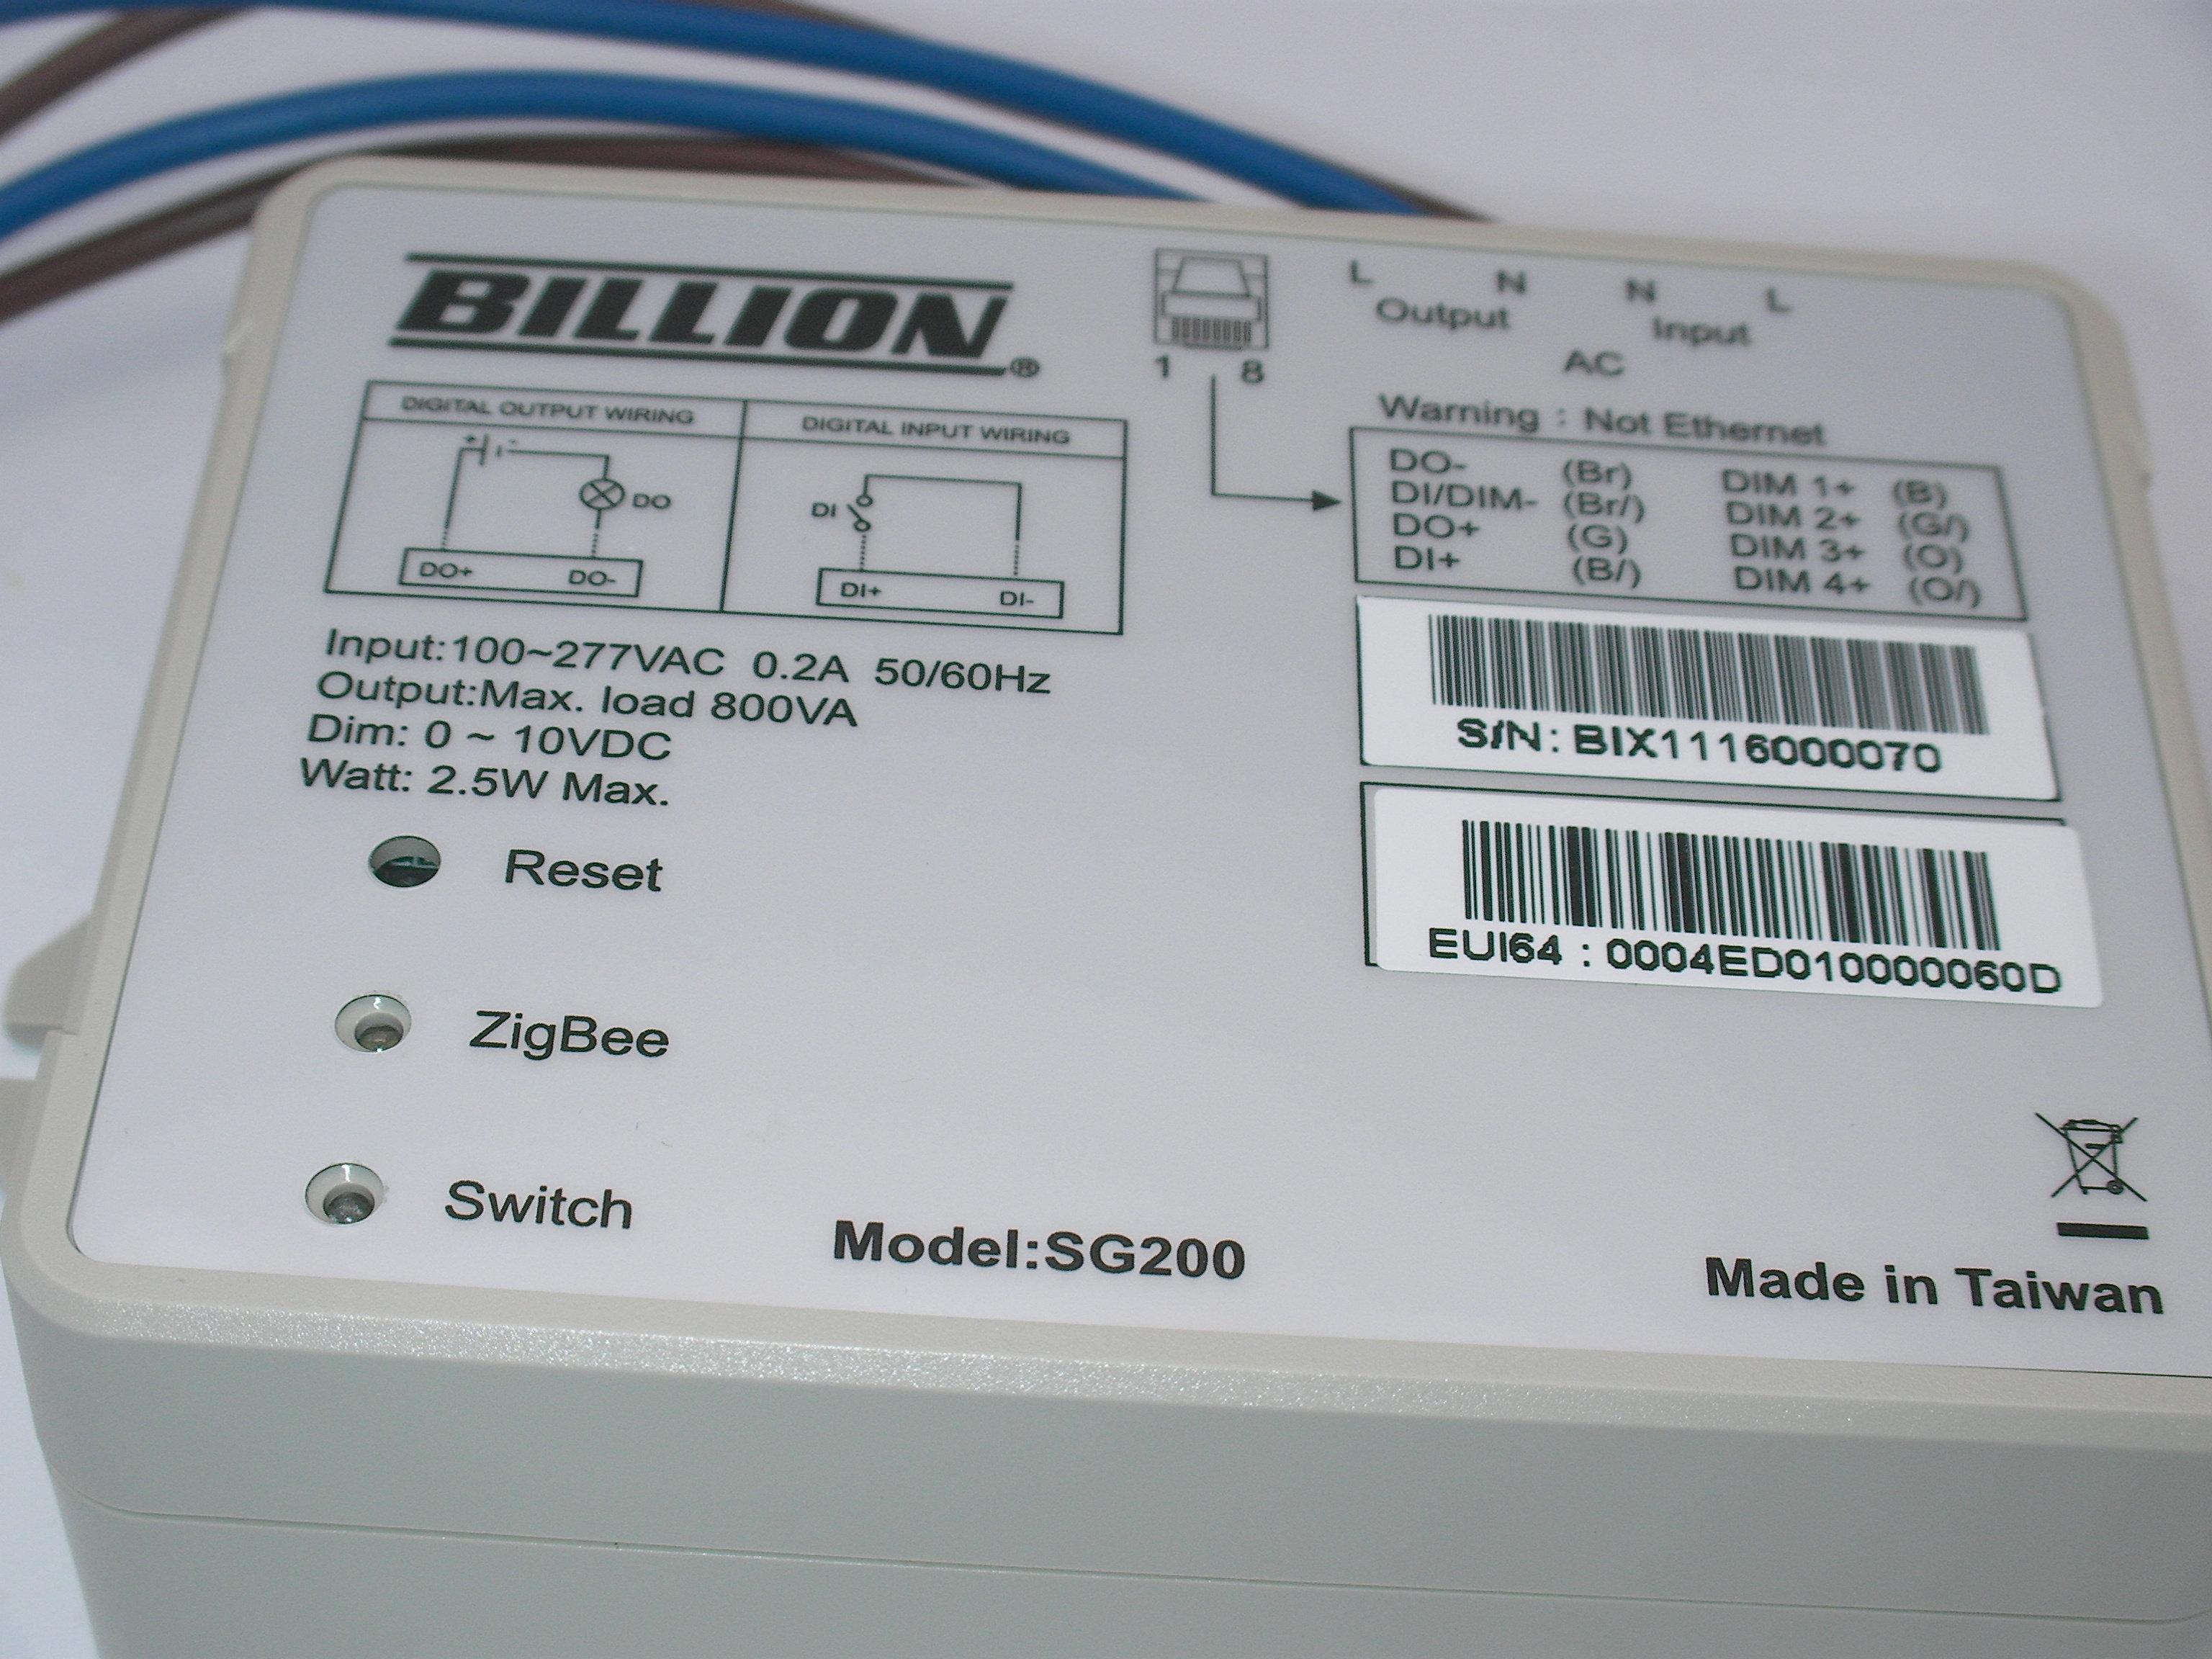 Billion SG200 Smart Lighting Control Box